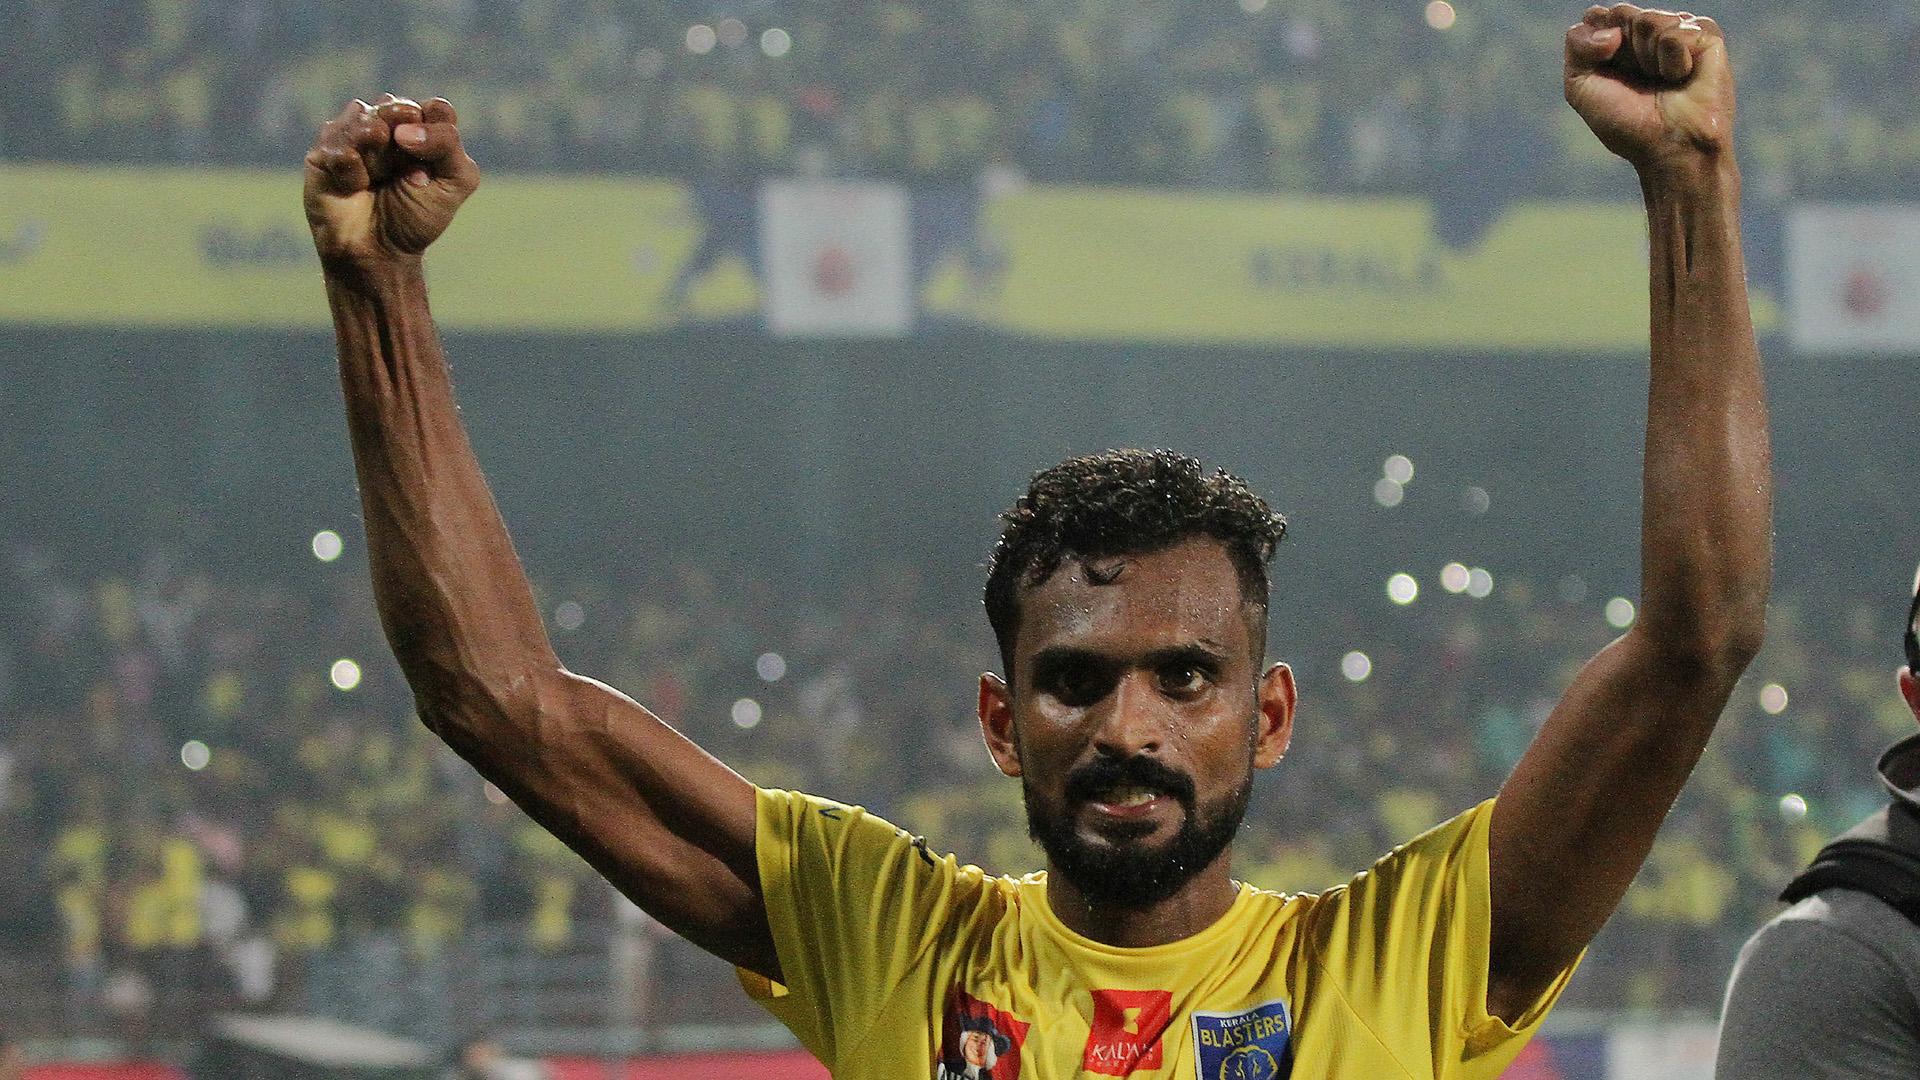 ISL champions ATK reach home city to warm reception